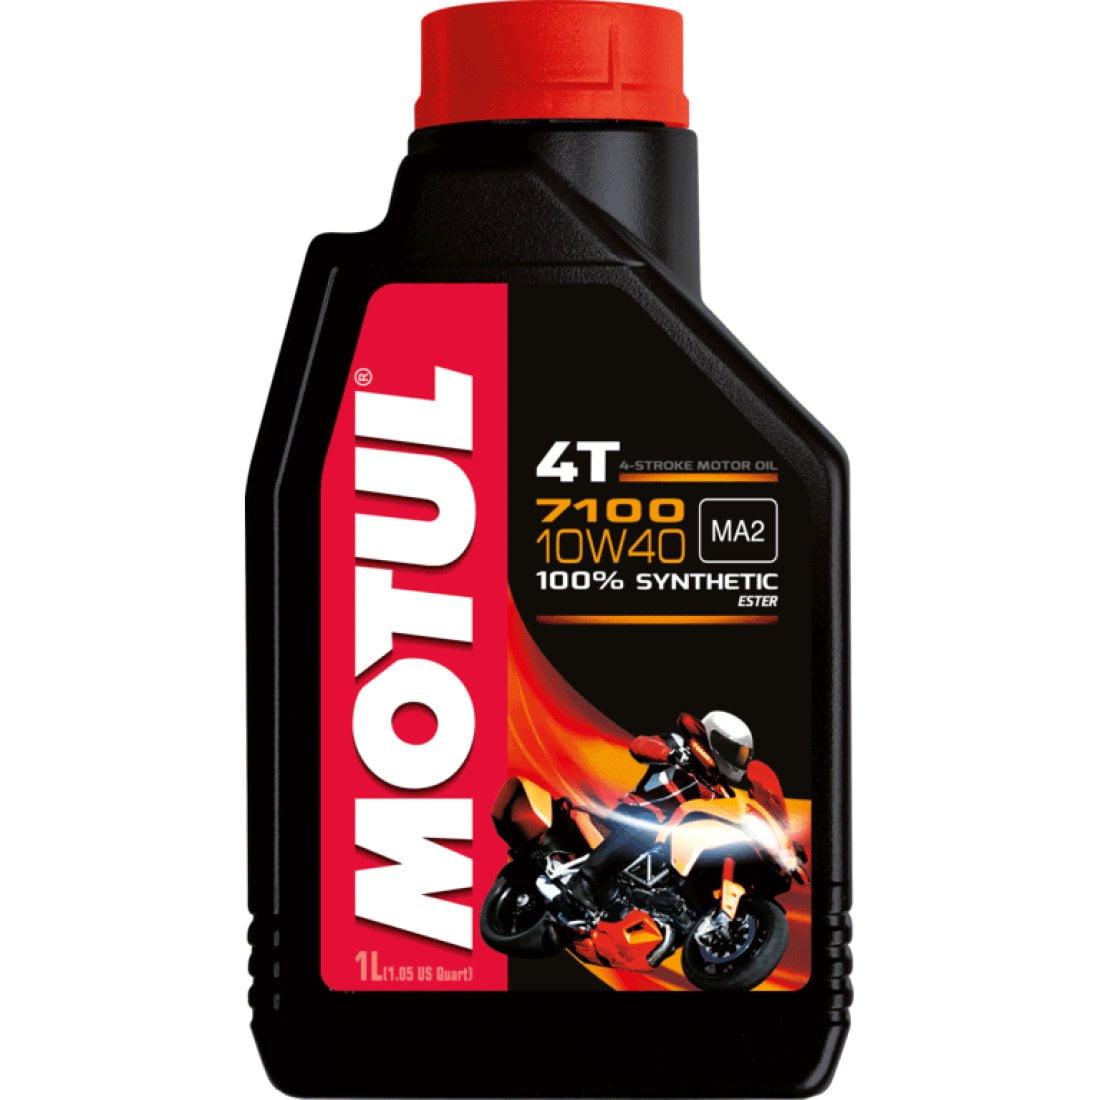 Oleo De Moto Motul 7100 10w40 Api SL 4T Sintético 1Lt